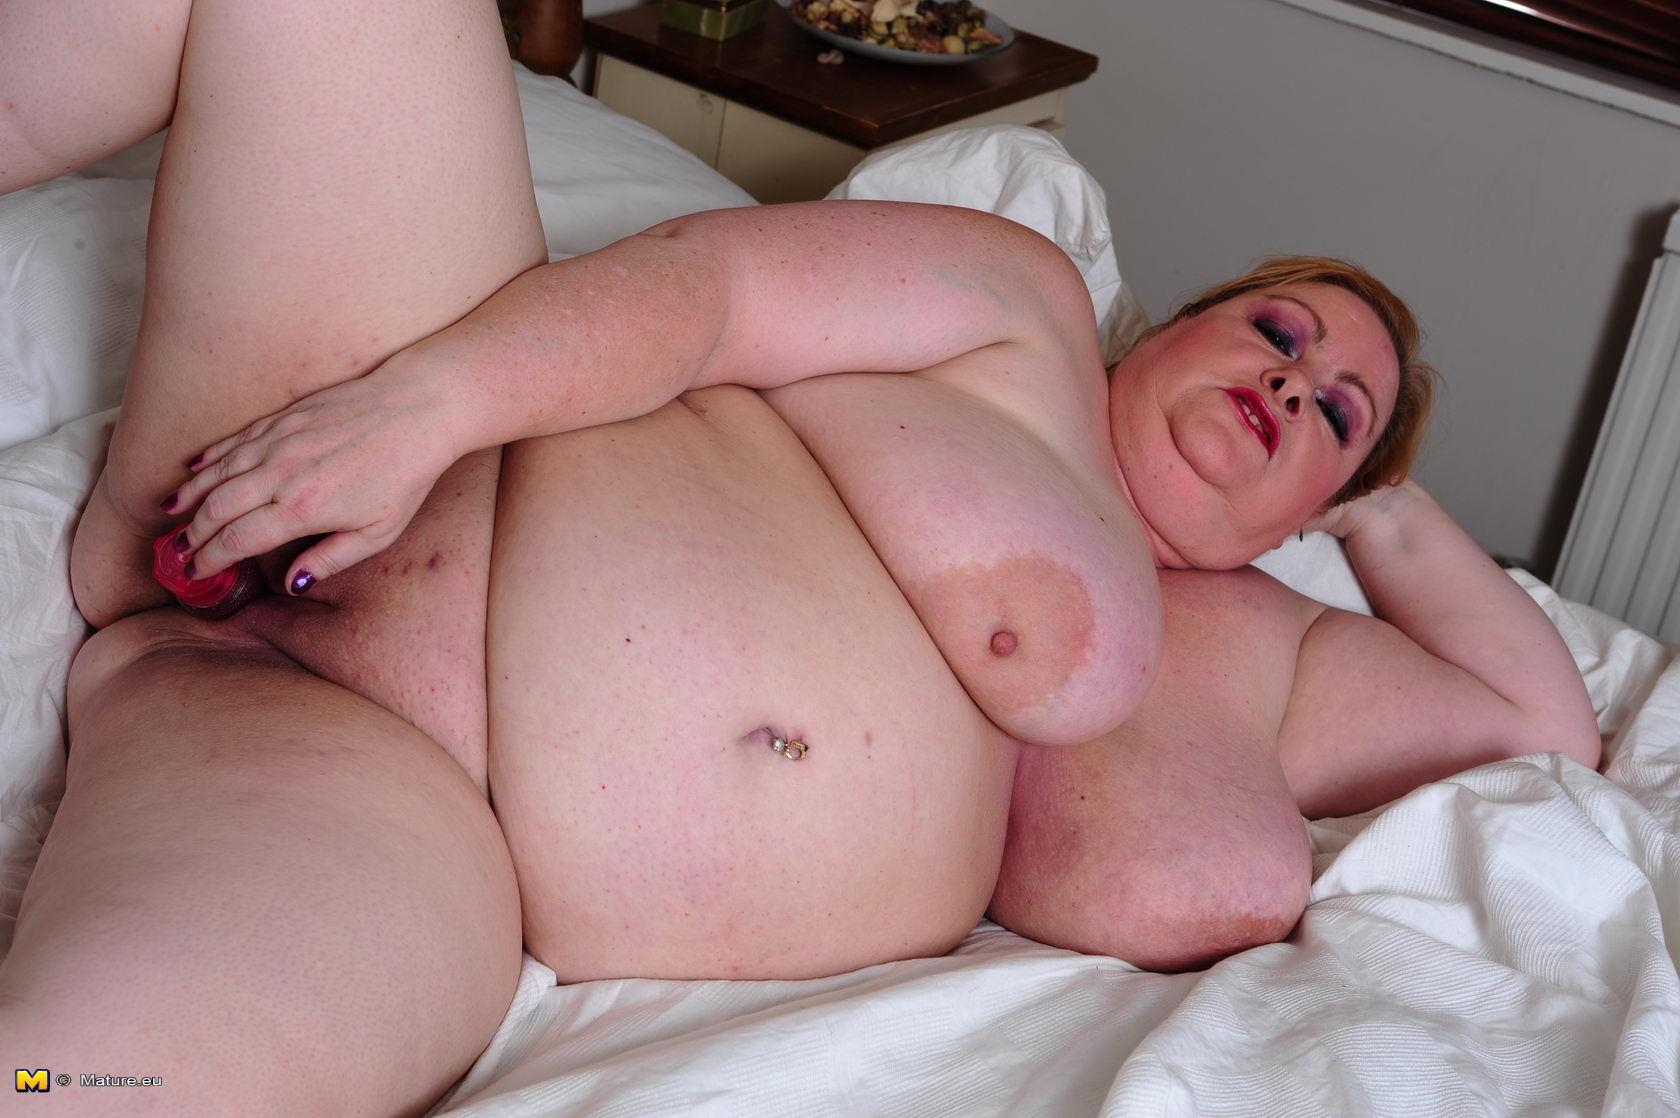 Teen nude in dungarees